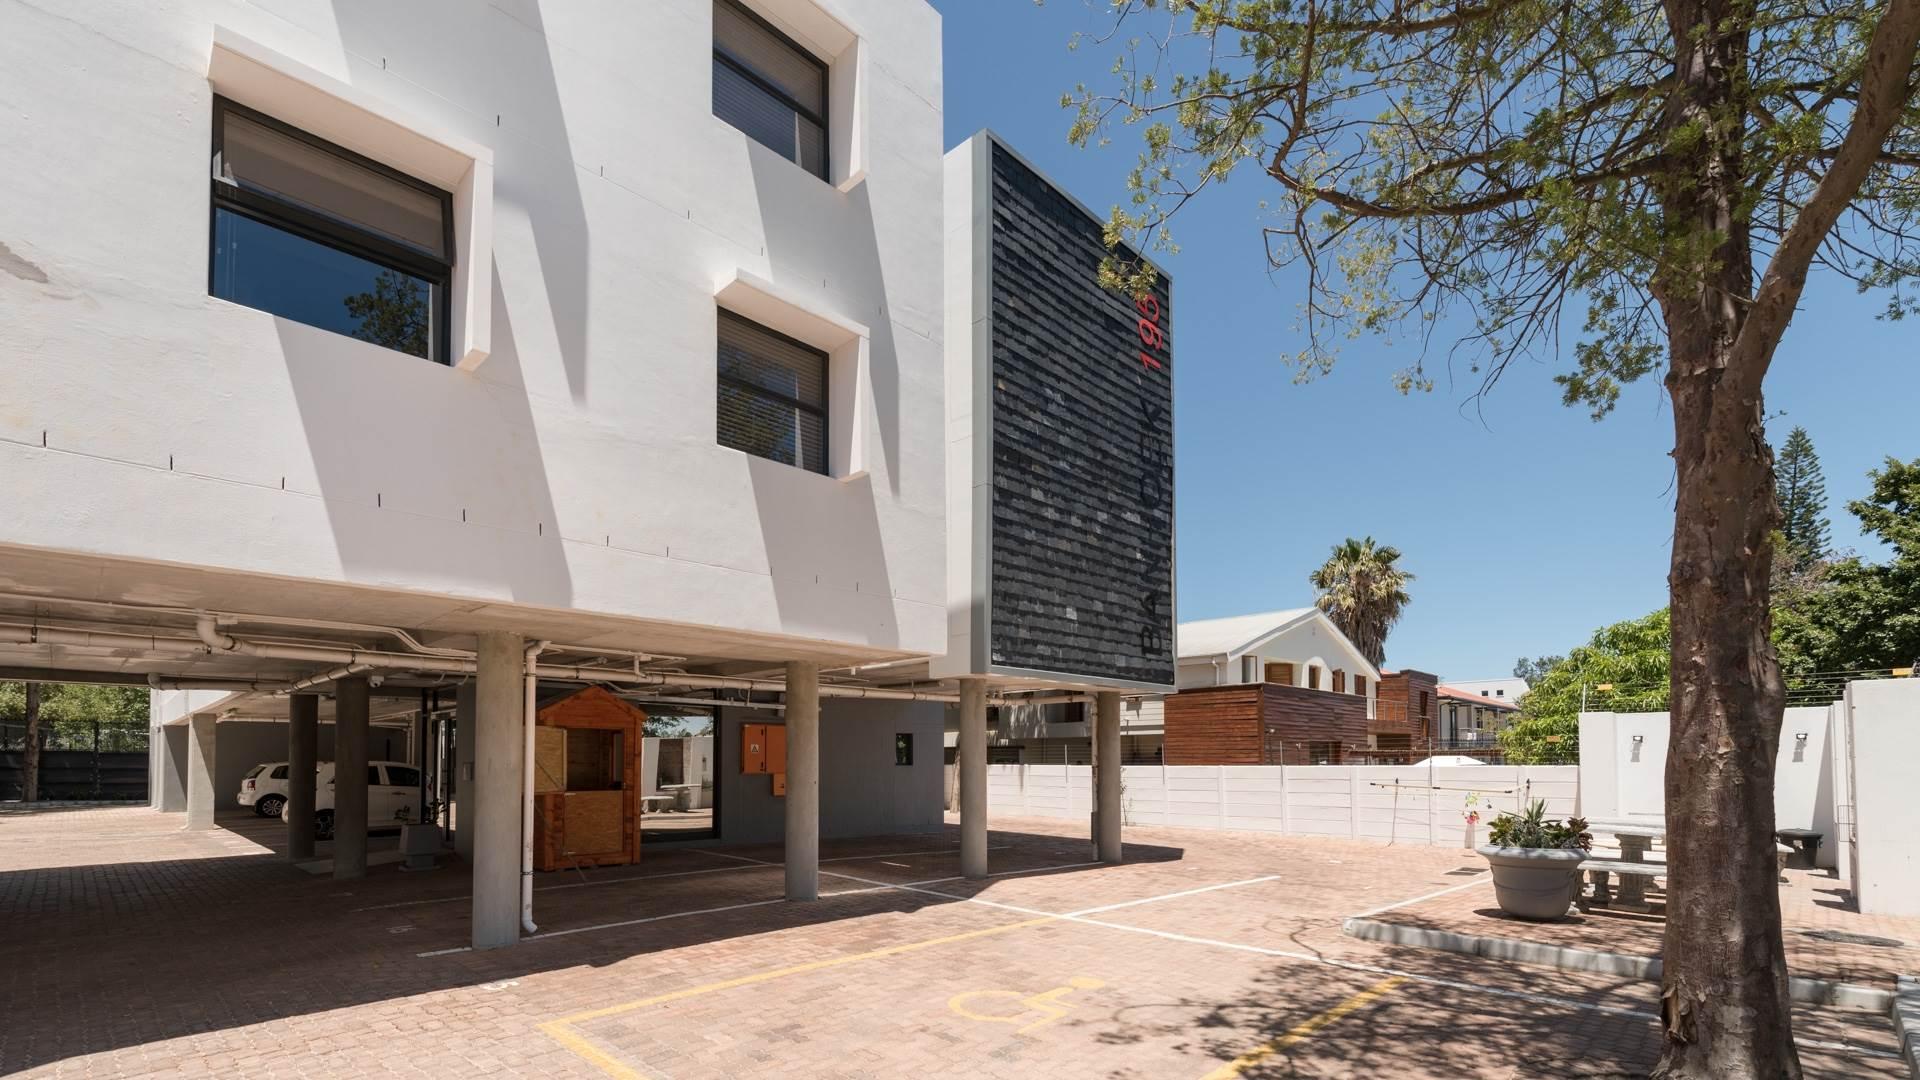 26 BedroomHouse For Sale In Universiteitsoord